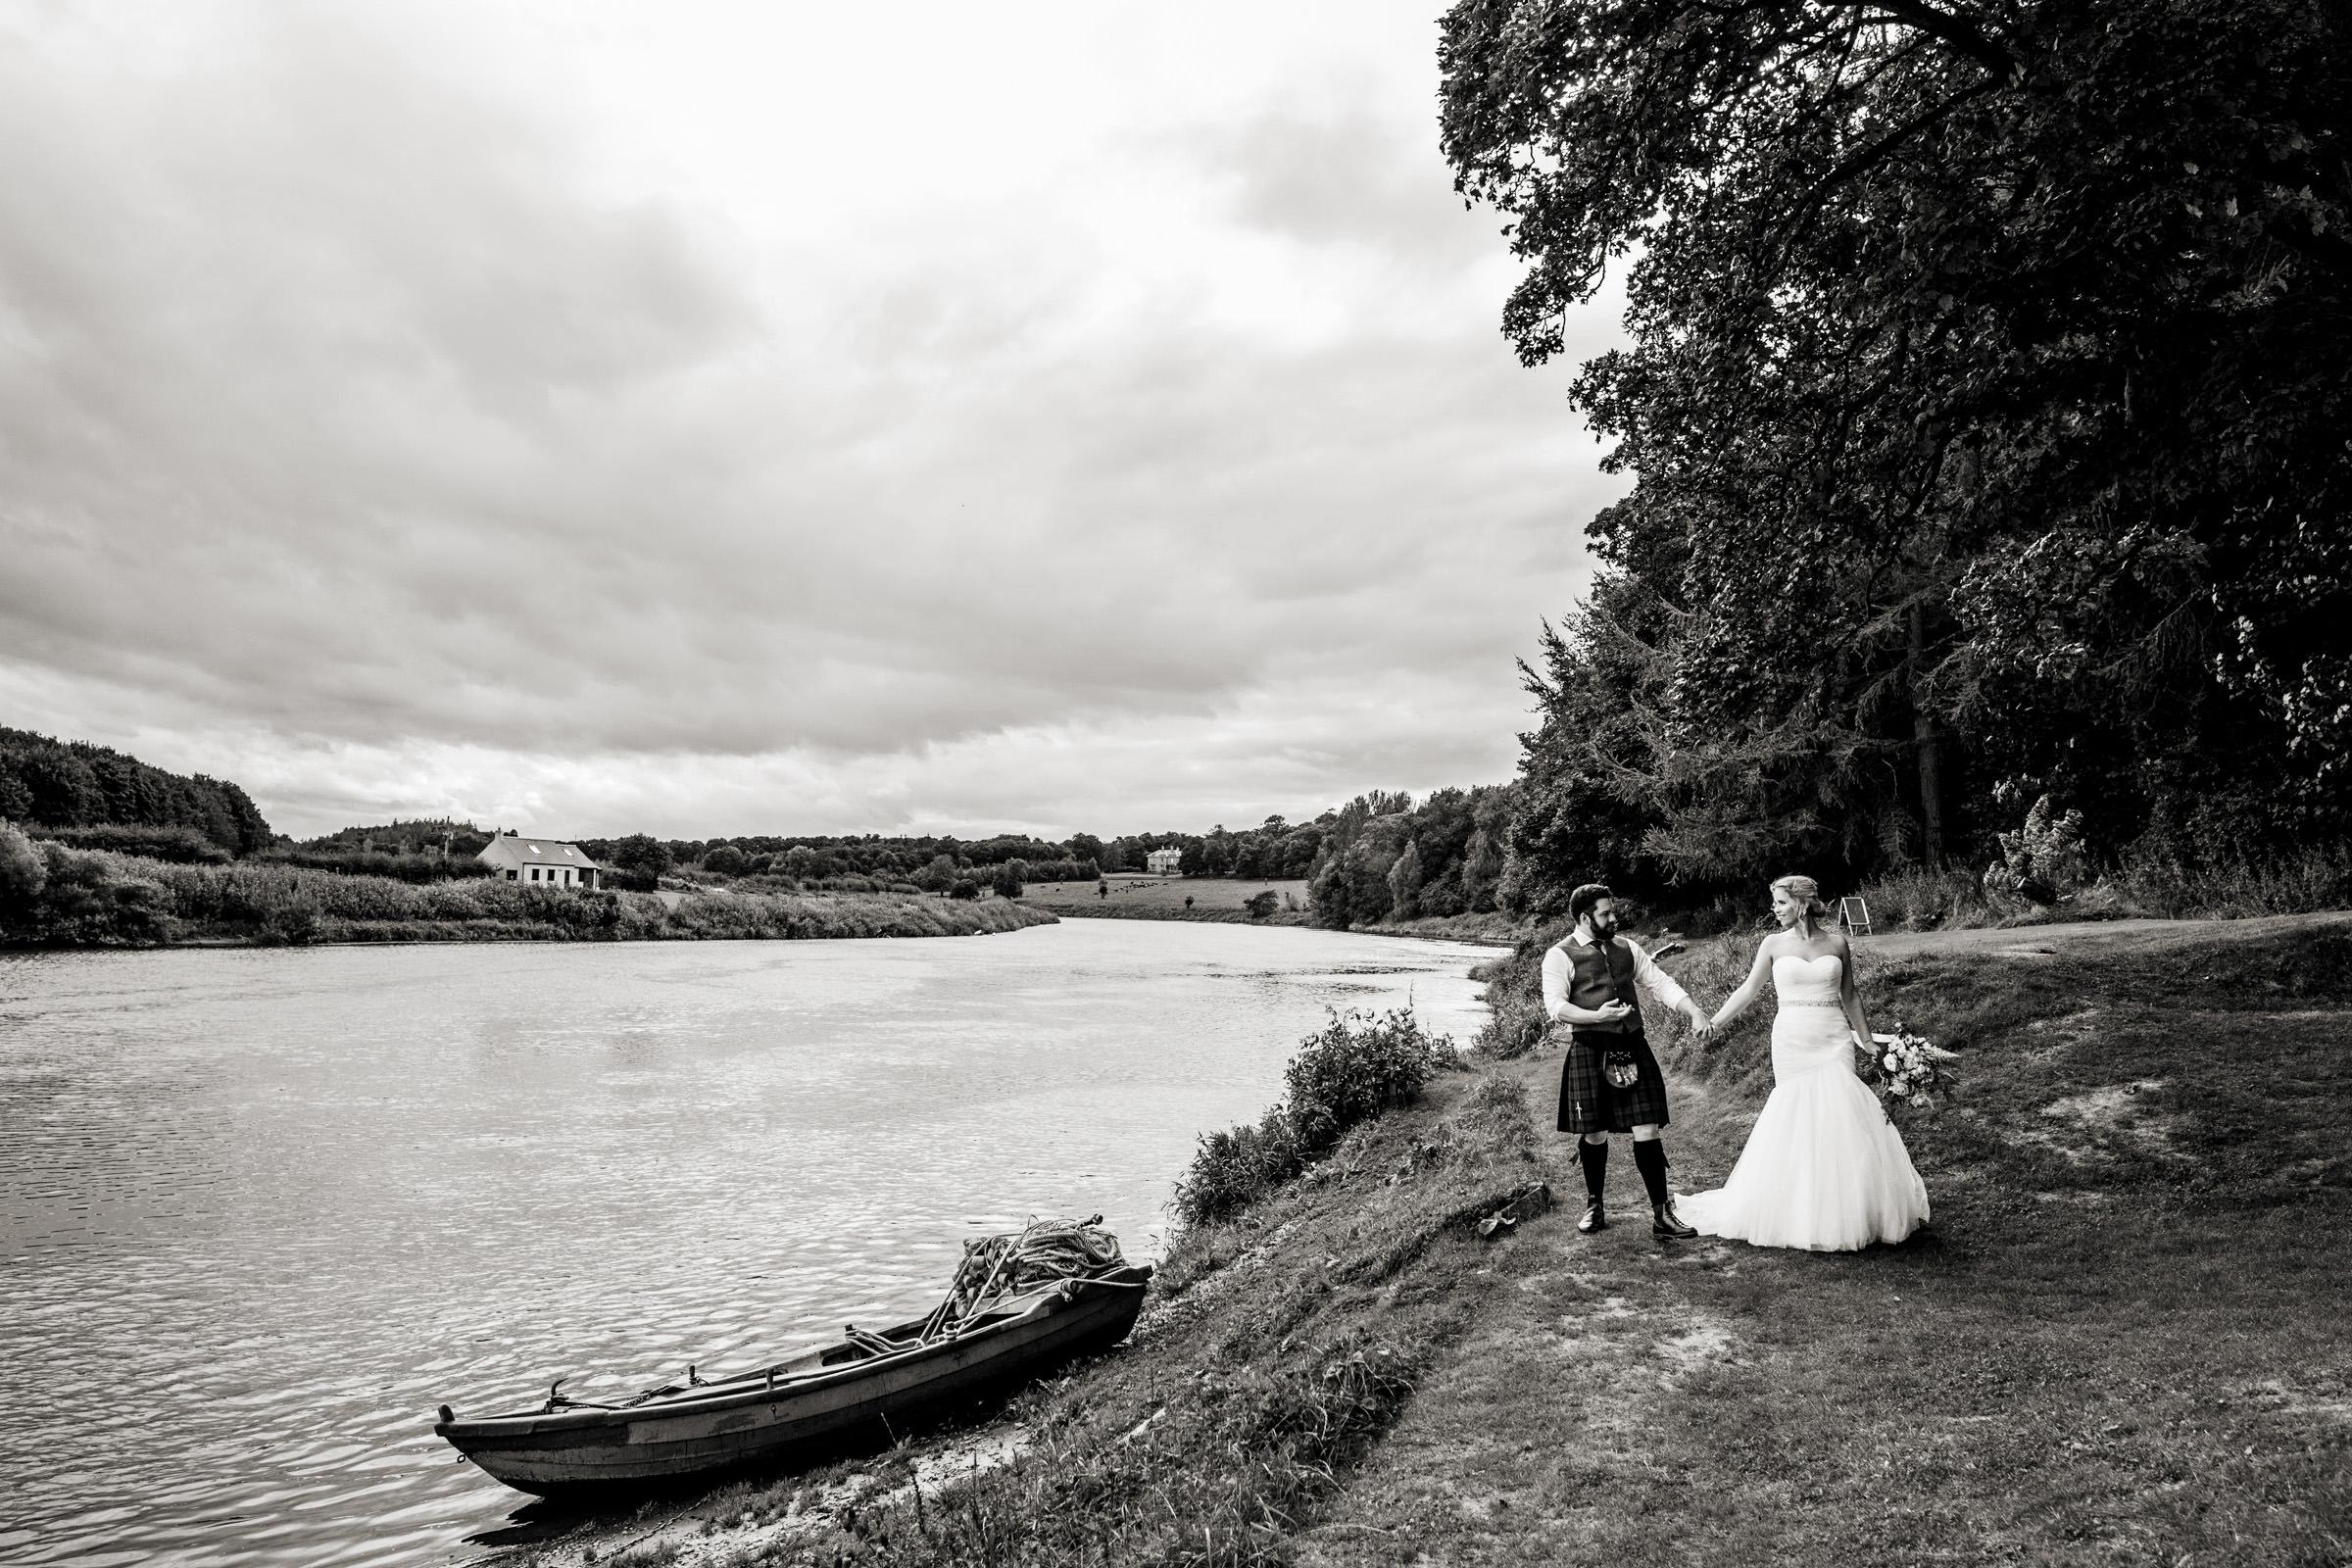 Documentart wedding photographers Berwick-upon-Tweed 013.jpg